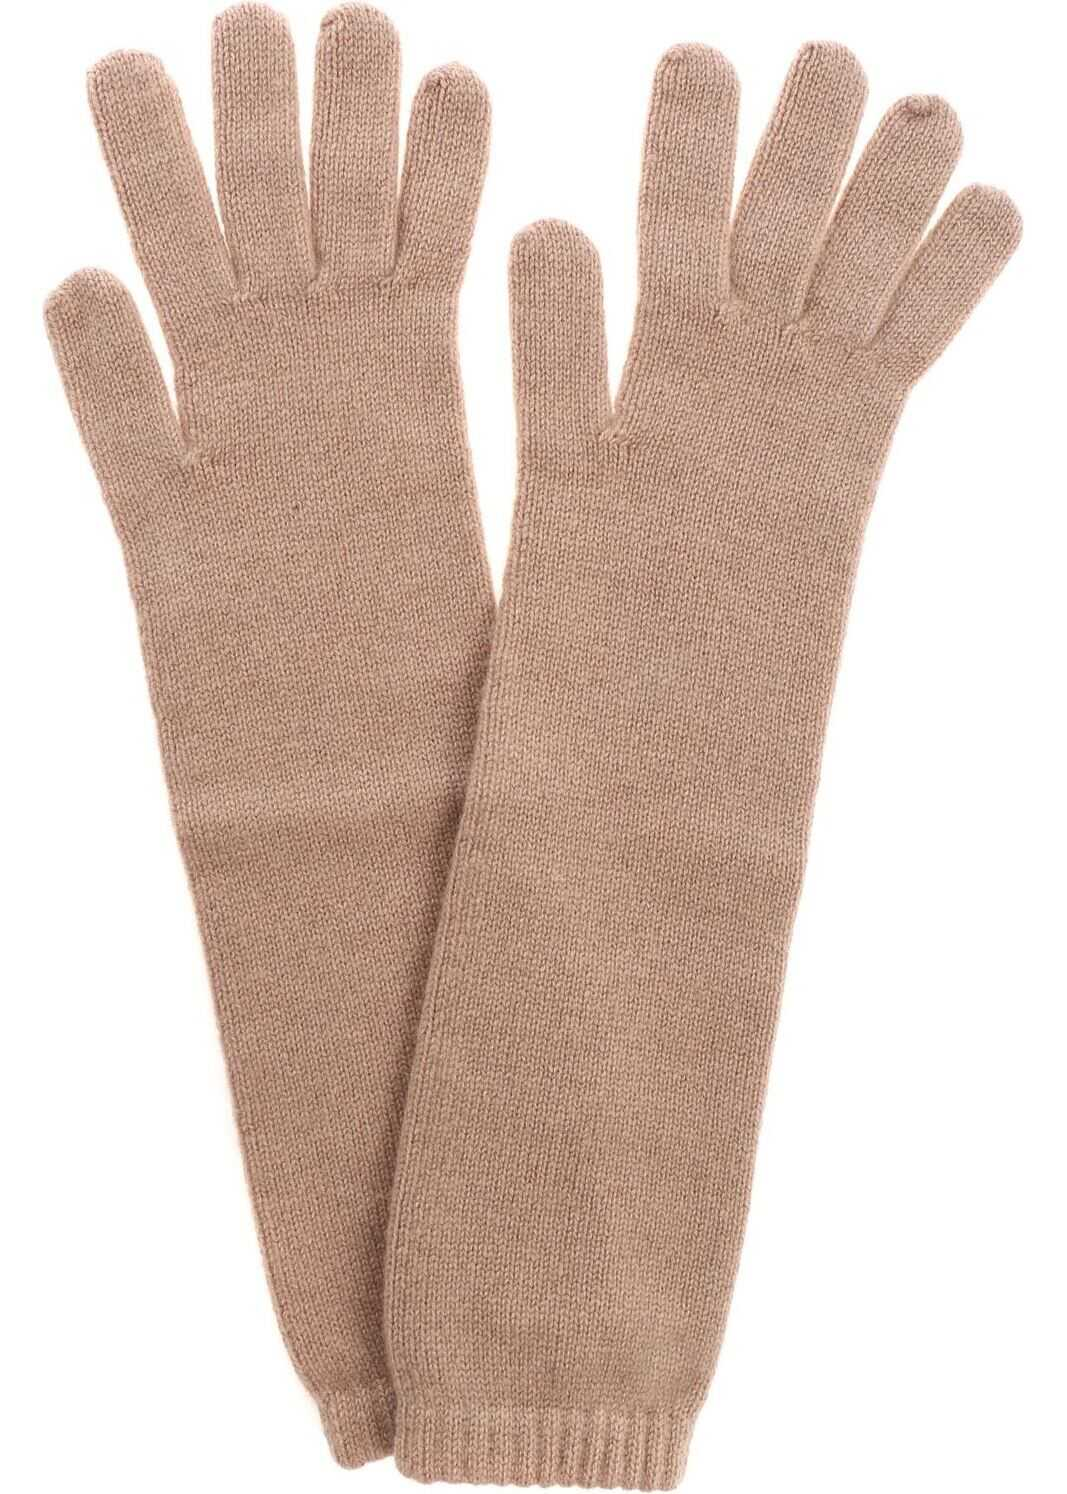 Kangra Cashmere Camel Cashmere Gloves Camel